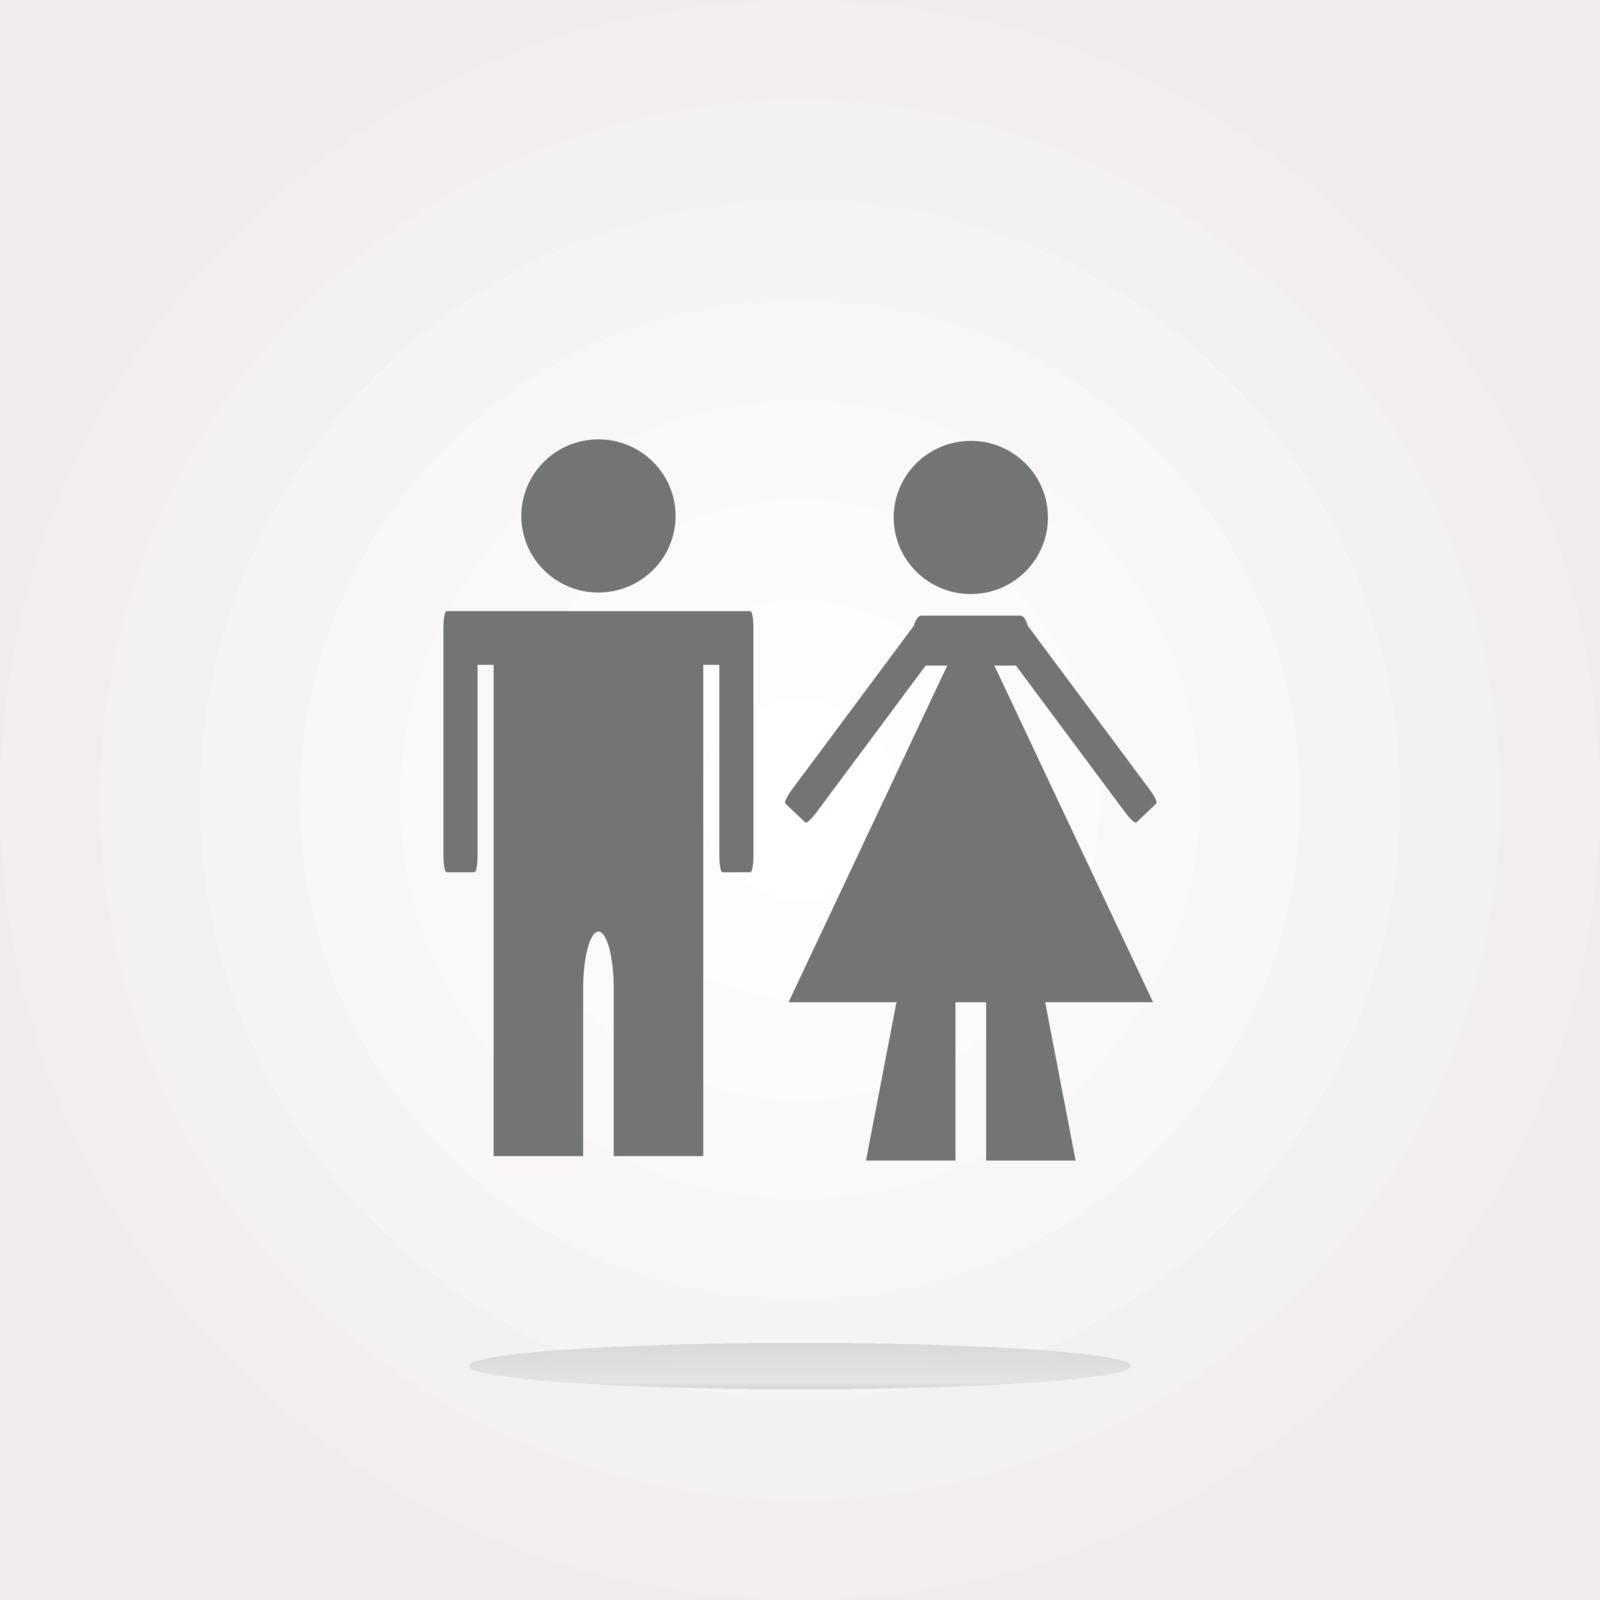 WC Icon. WC Icon Vector. WC Icon Art. WC Icon eps. WC Icon Image. WC Icon logo. WC Icon Sign. WC Icon Flat. WC Icon design. WC icon app. WC icon UI. WC icon web. WC icon gray. WC icon simple. icon WC